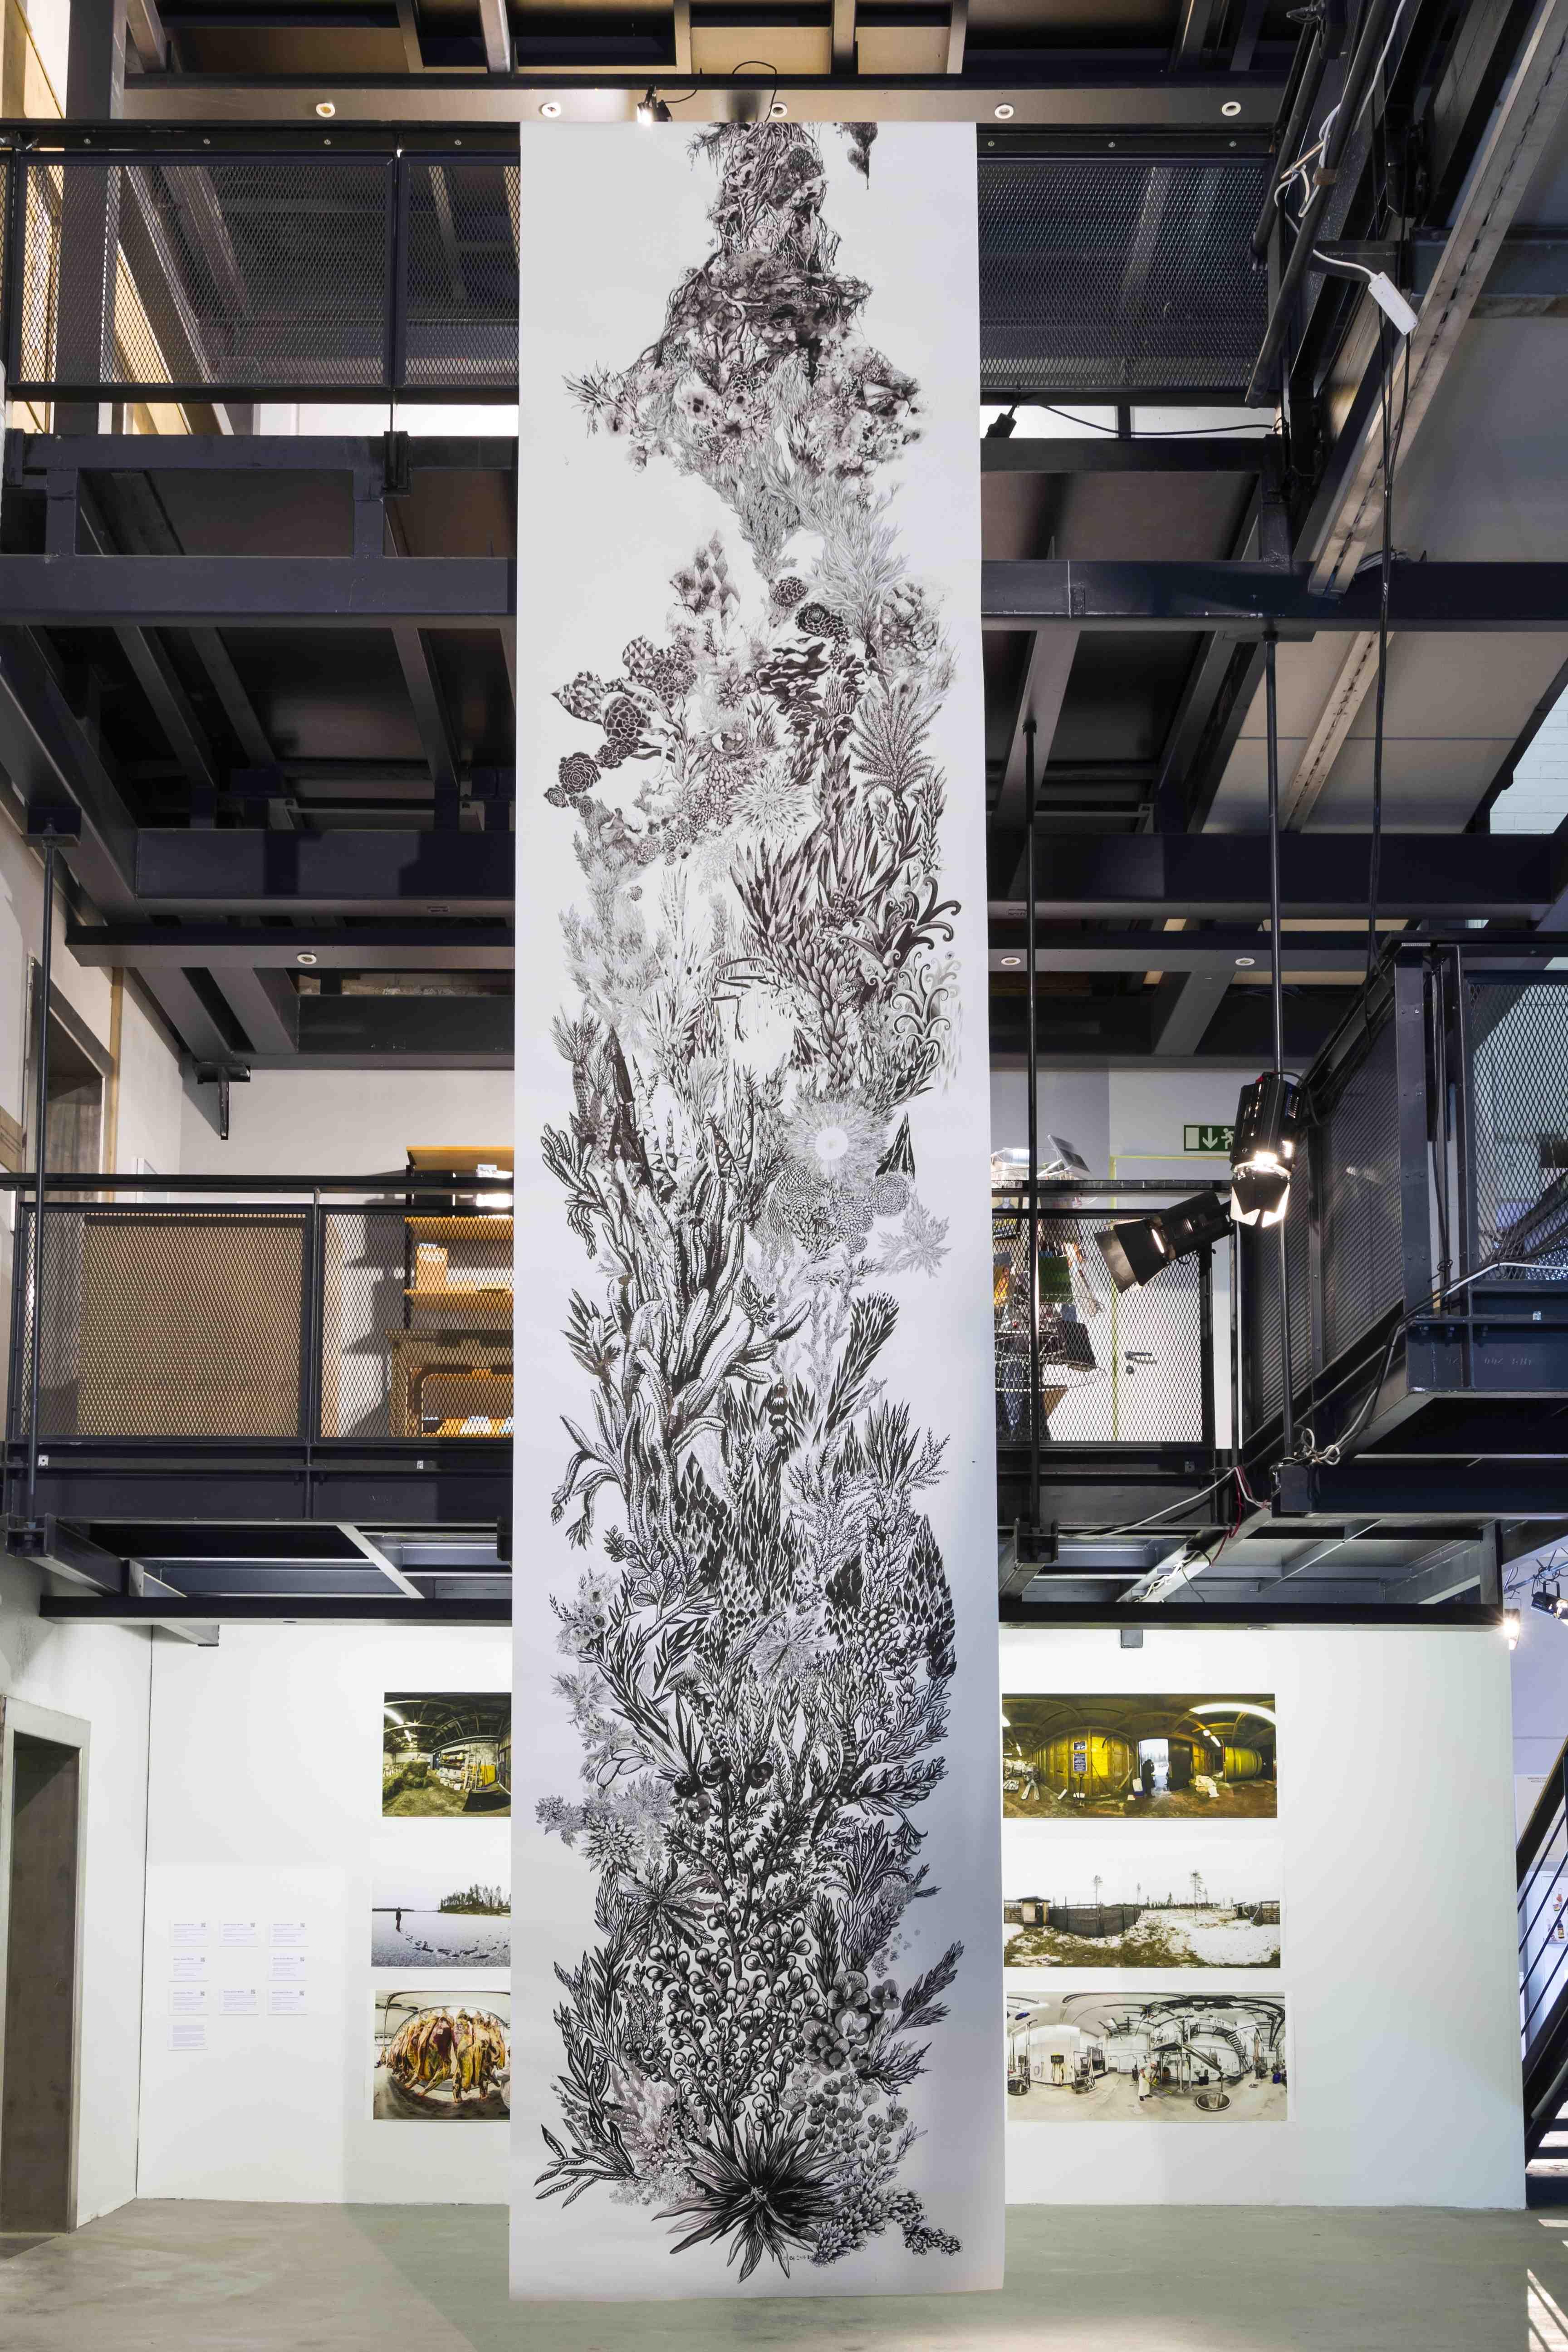 Art Central - Dwi Setiant, Growth, 2016, Mixed Media, 12m x 3.5H Sin Sin Fine Artlr